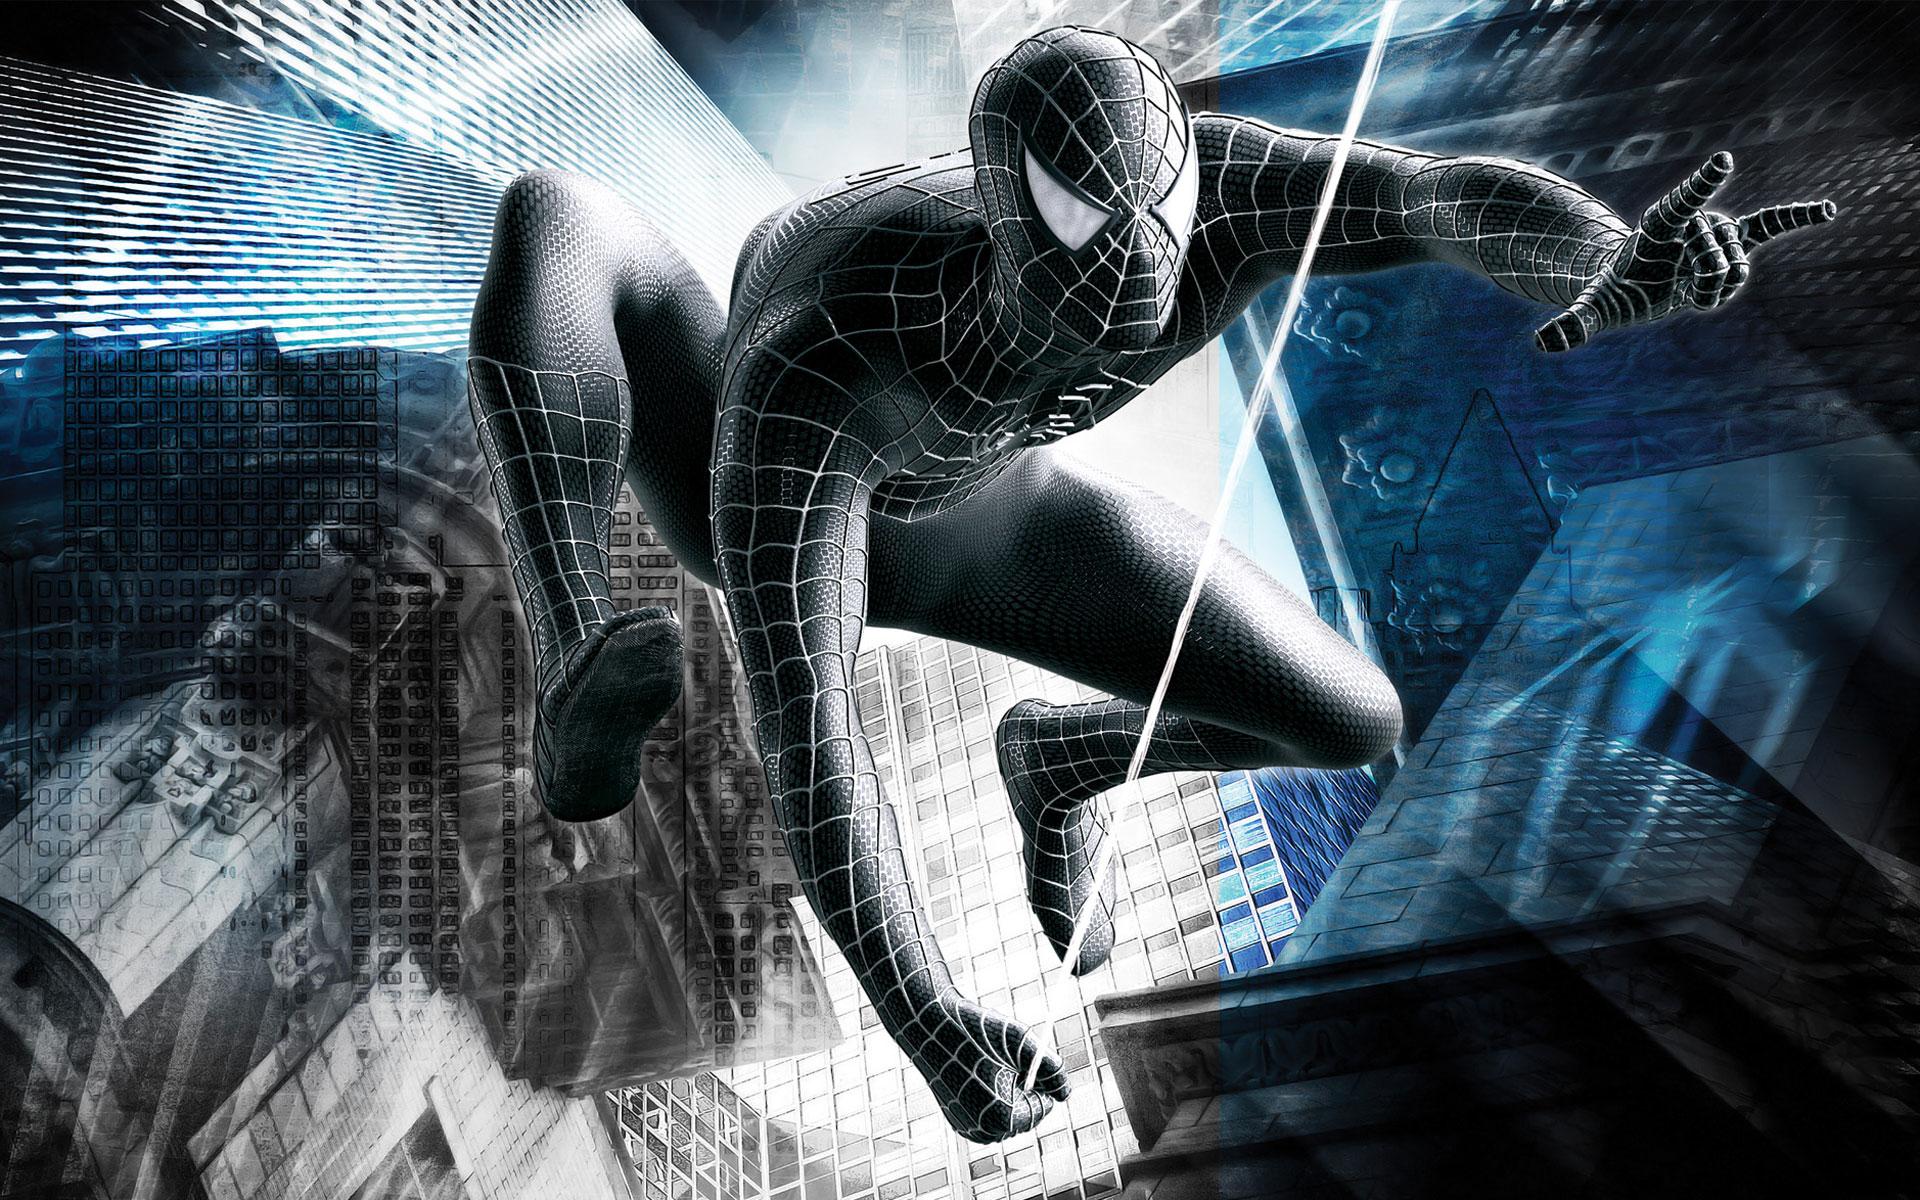 Harley Quinn Wallpaper Iphone Black Spiderman Iphone Wallpapers Hd Pixelstalk Net